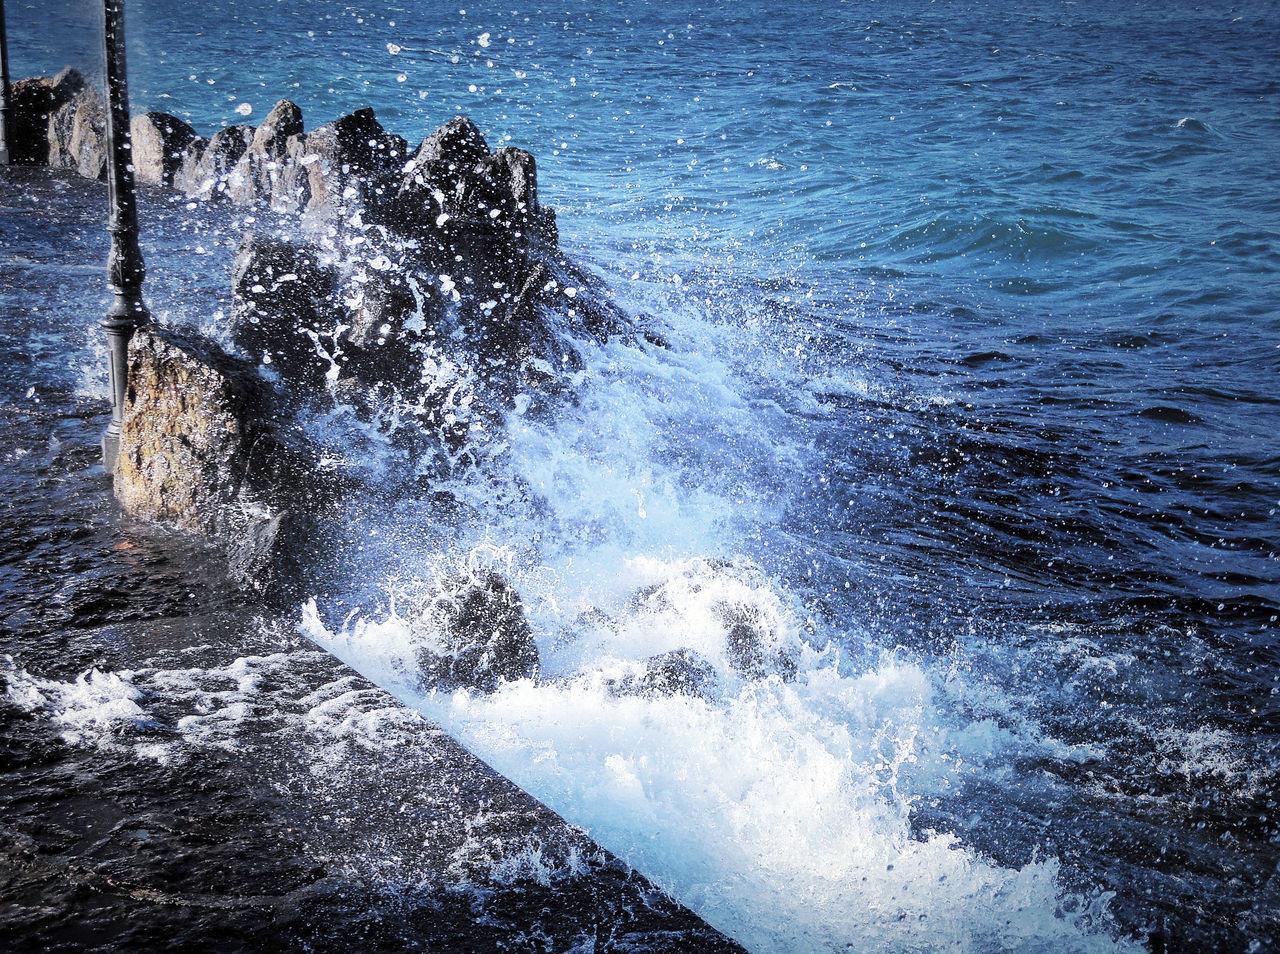 Capturing Motion Lakeshore Outdoors Splashing Waves Spurt Of Water Water Foam Waterfront Windy Day